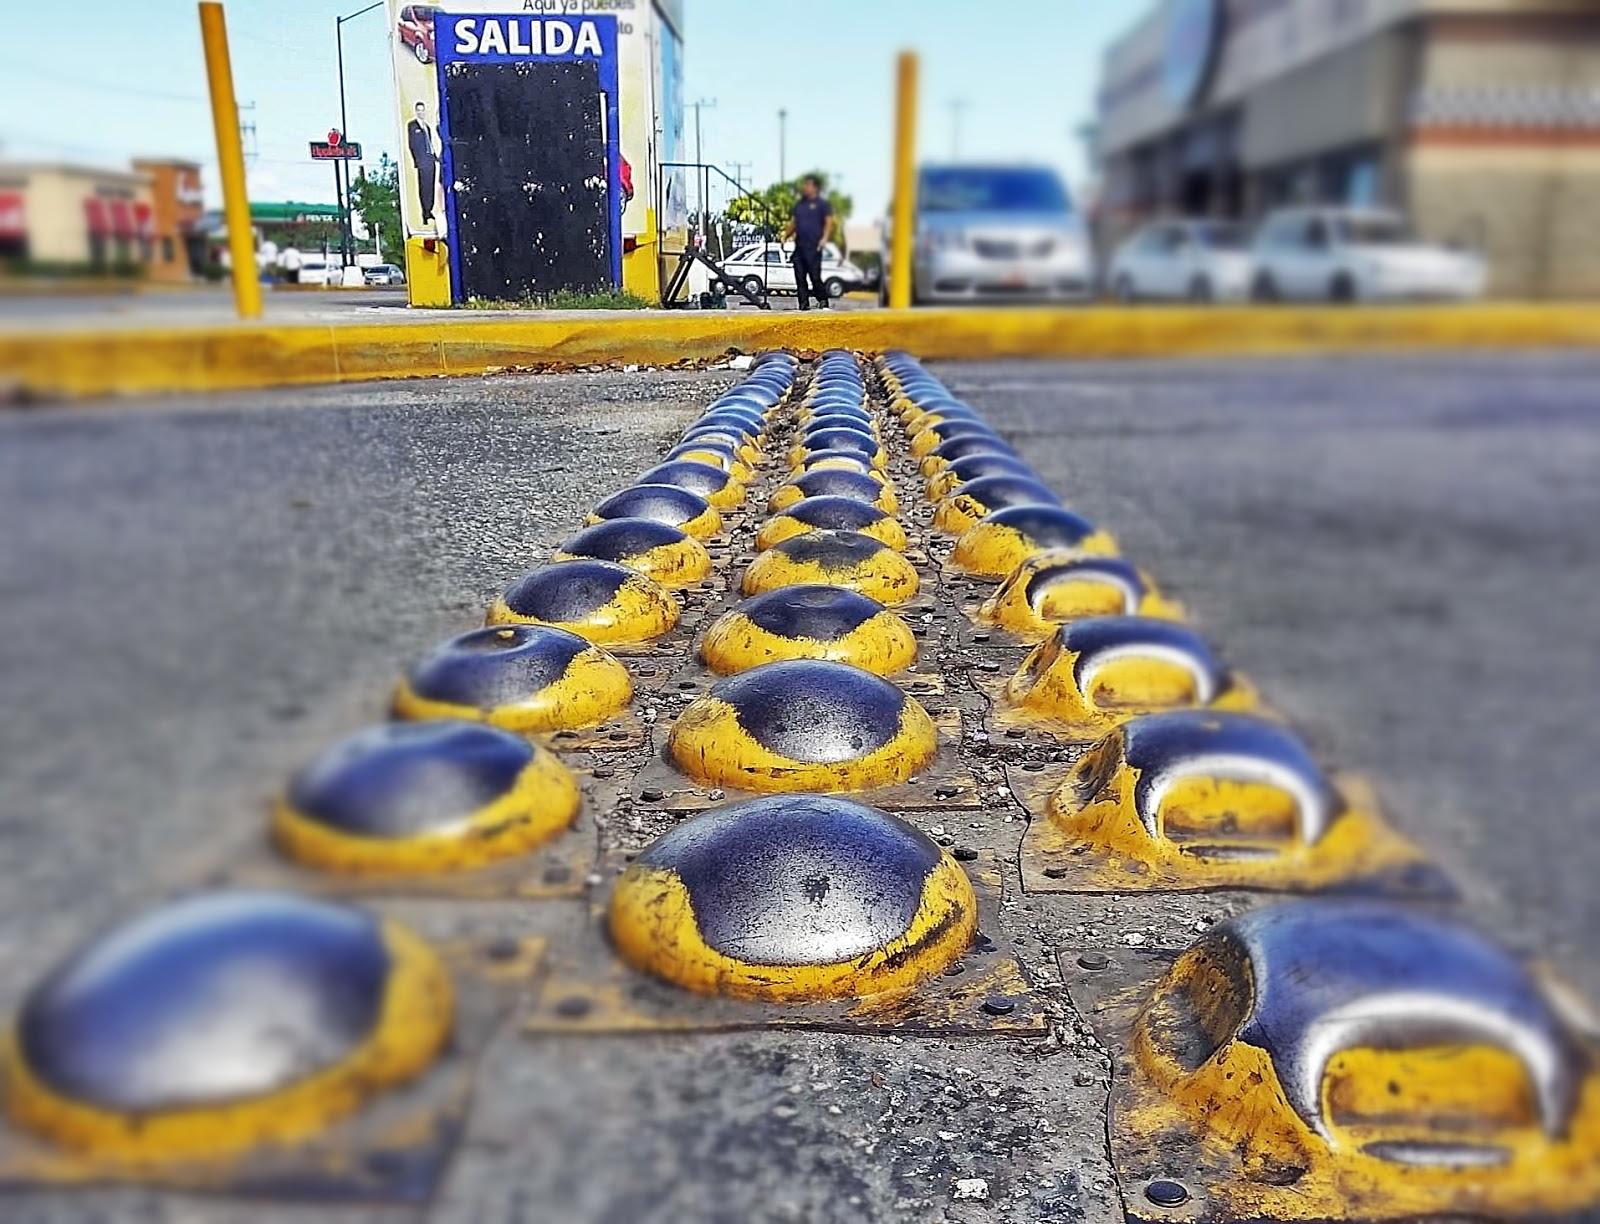 0 Down Car >> Joe's Retirement Blog: Effective Inventions, Cancun, Quintana Roo, Yucatan Peninsula, Mexico